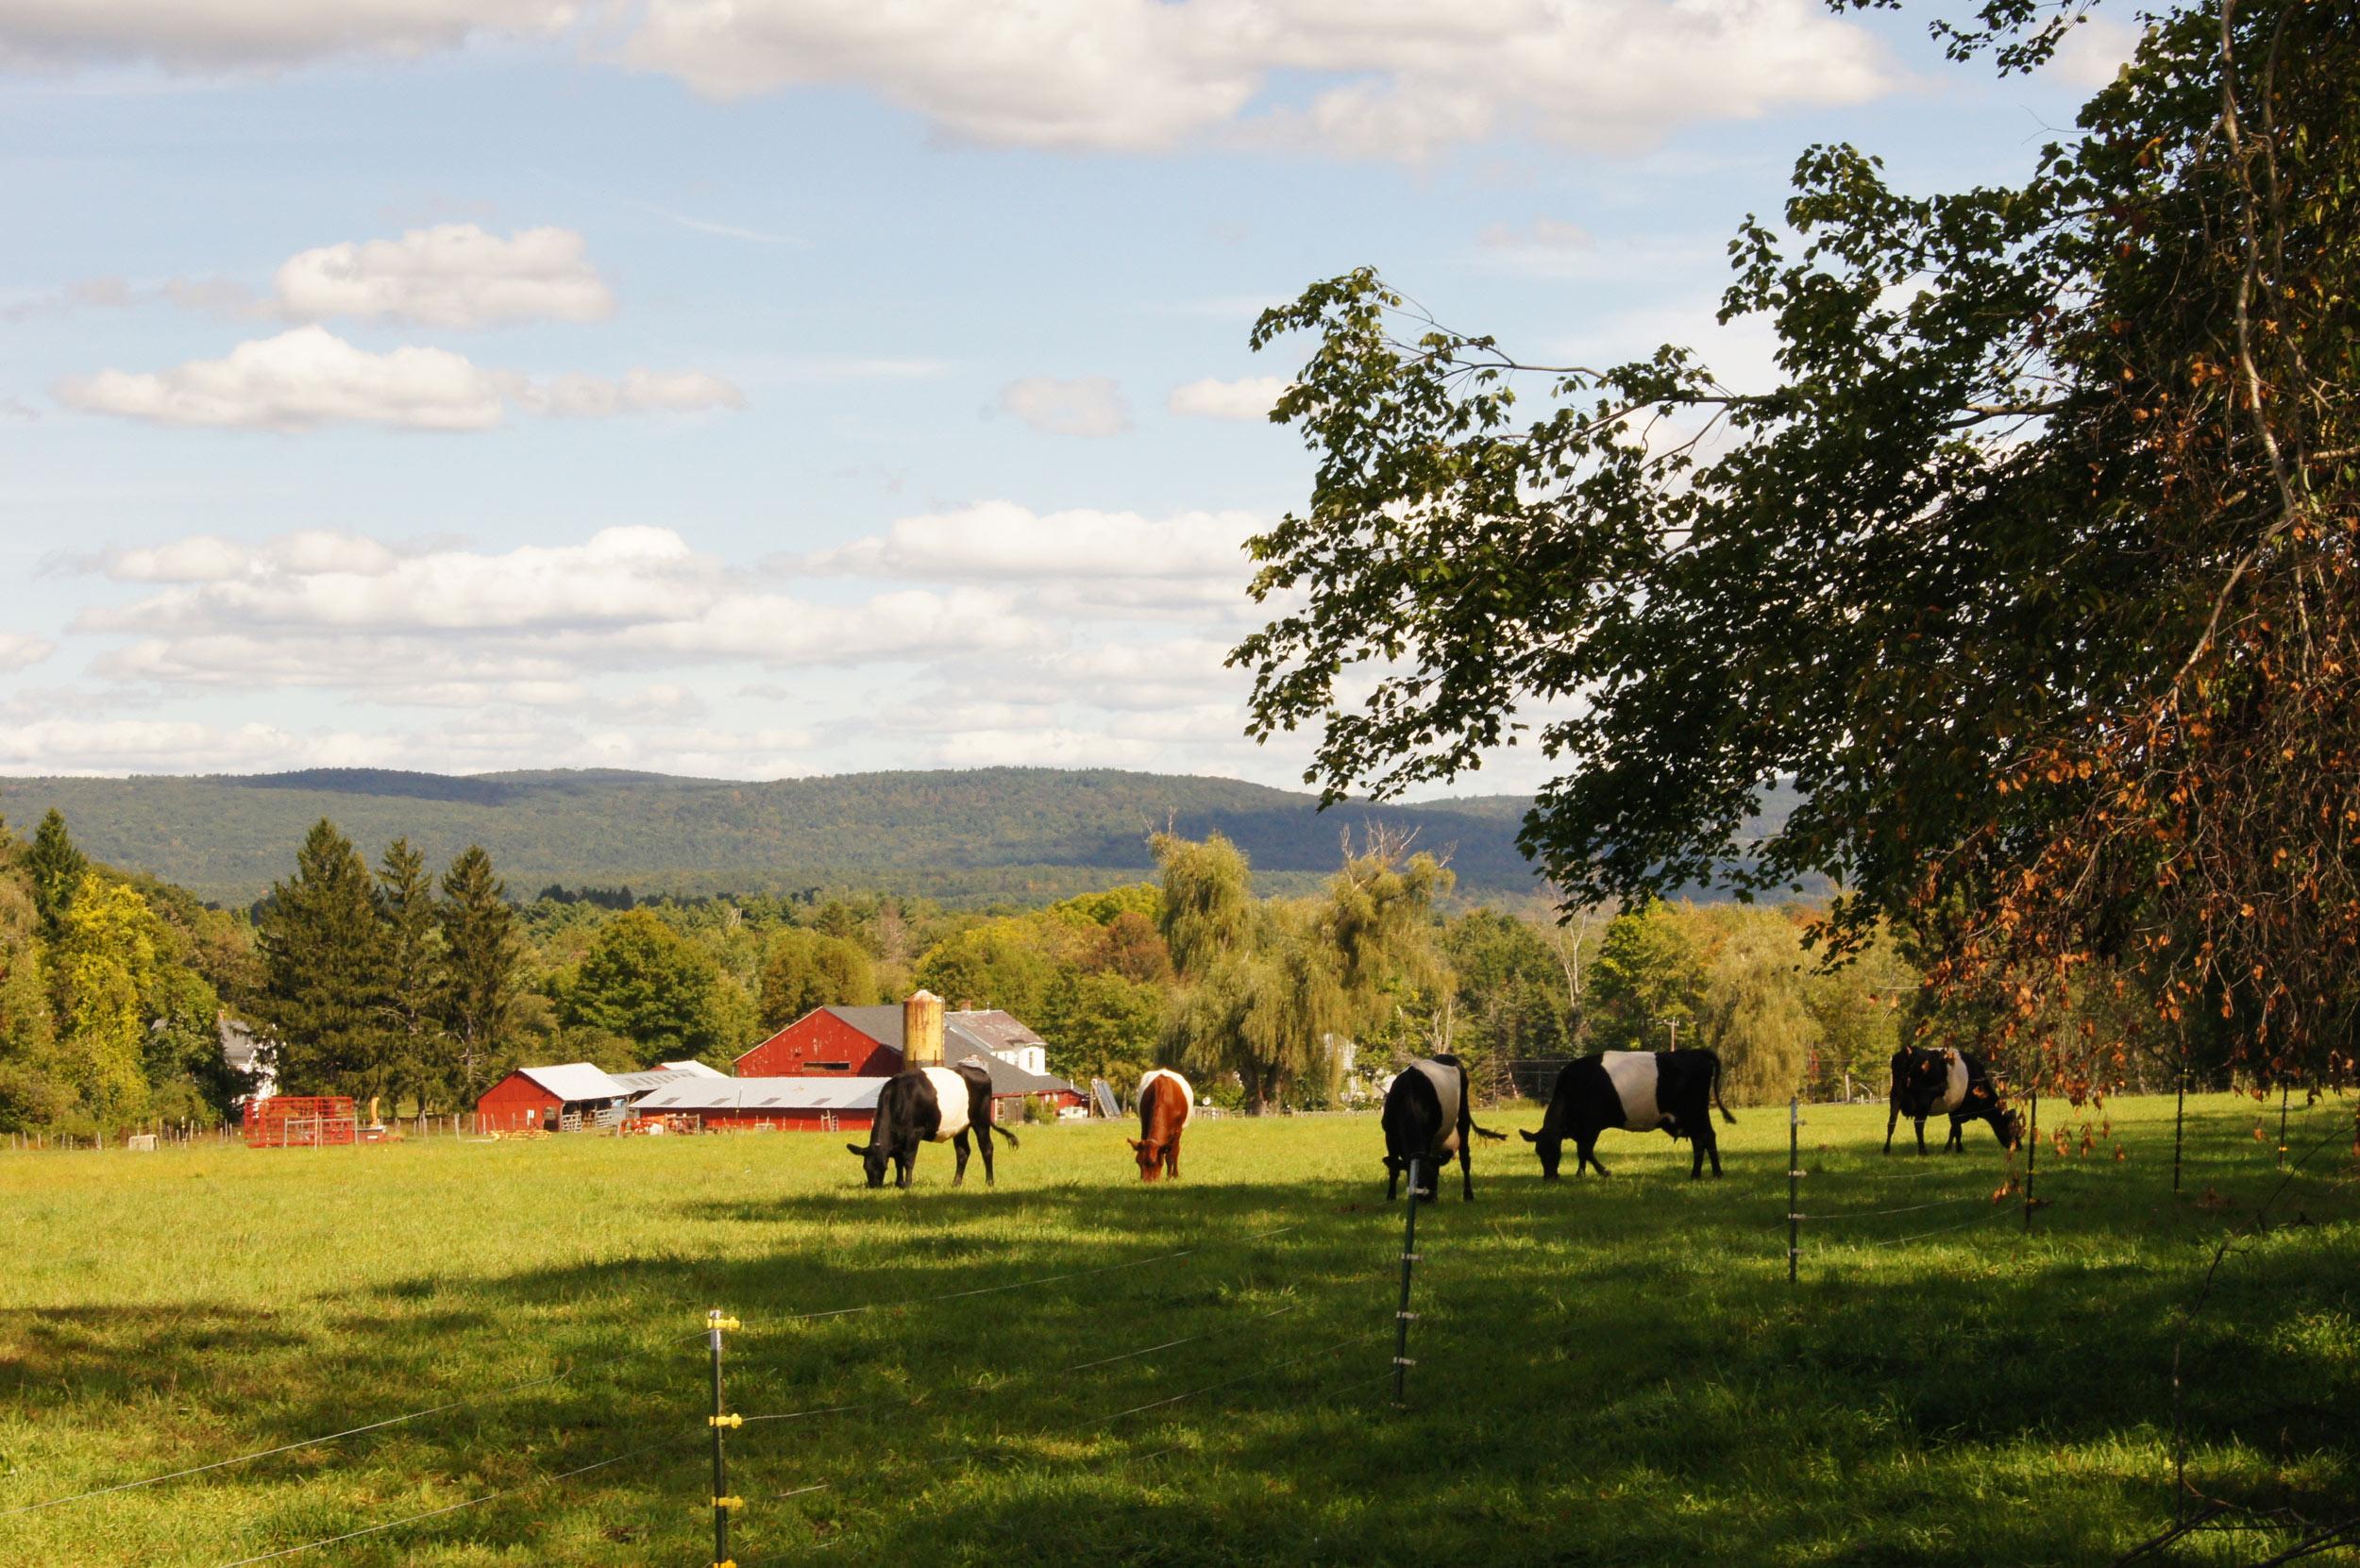 Food, Farm, and Sustainability